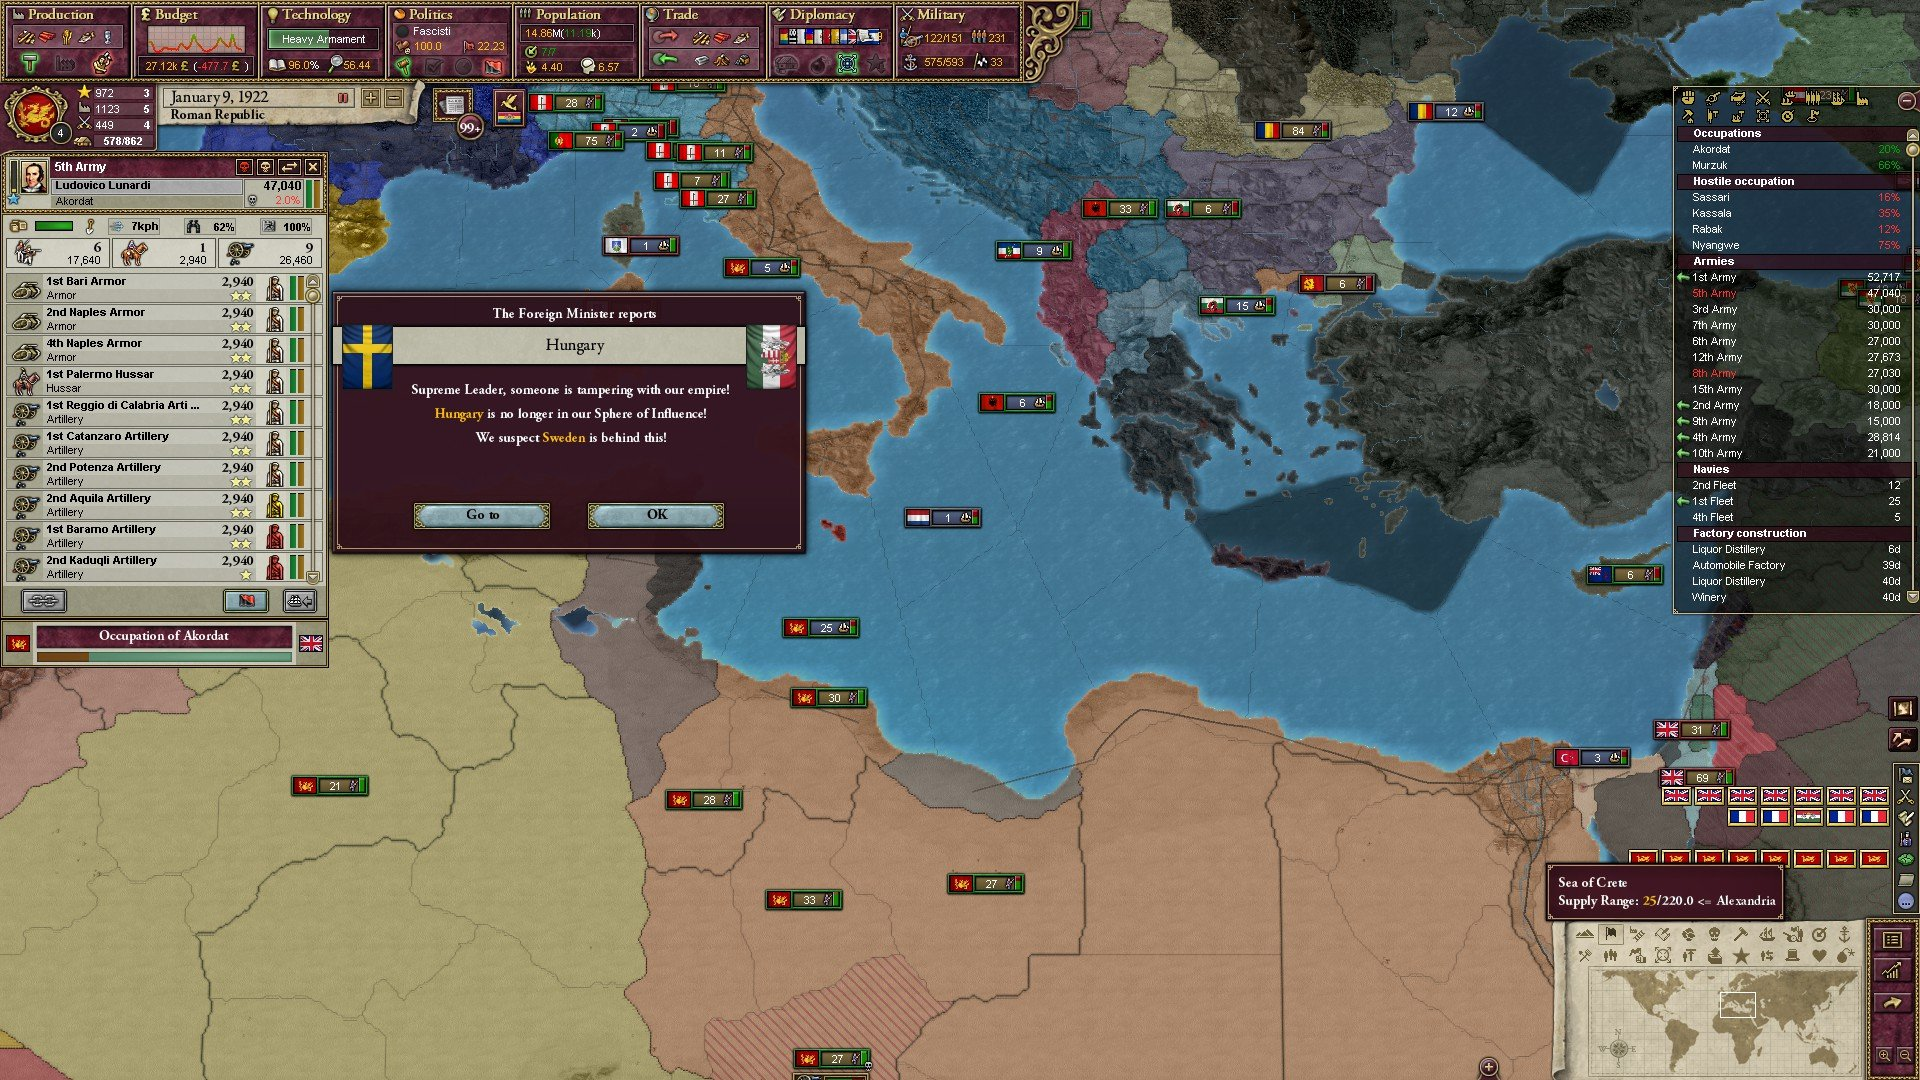 God Wills It - A HPM Roman AAR - Part 18 - After Action Report